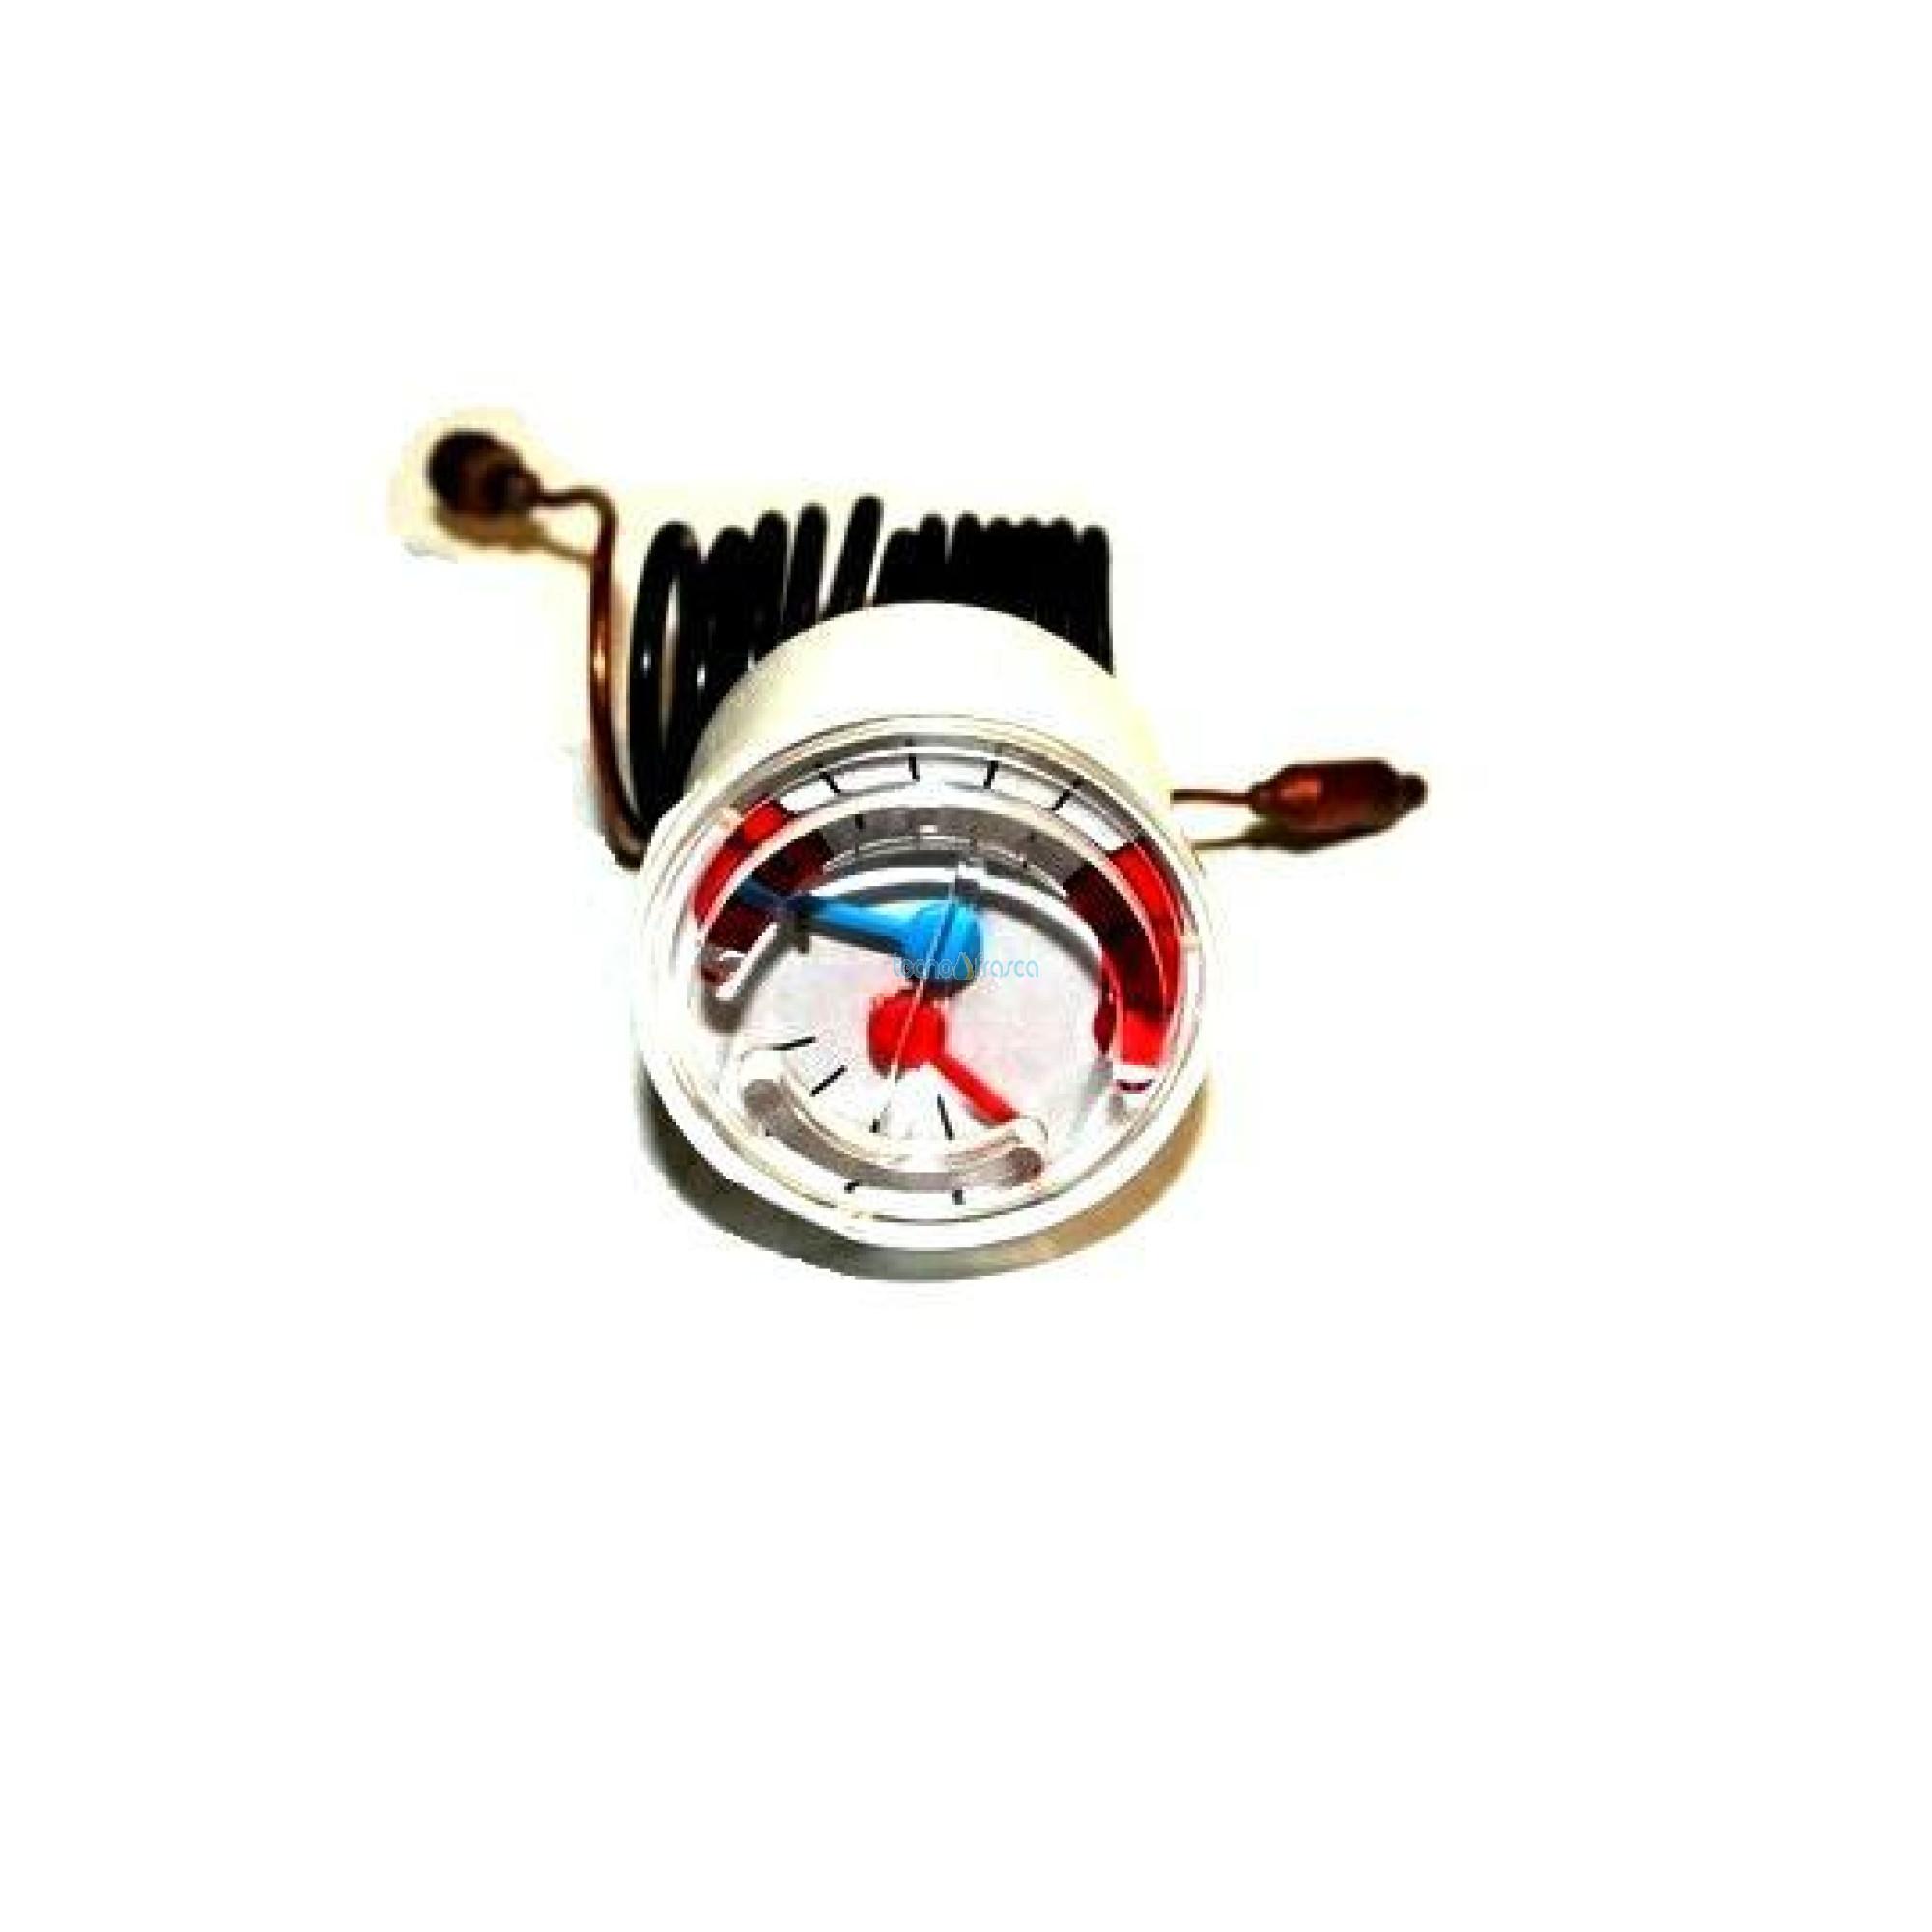 Beretta termoidrometro mynute R10023821